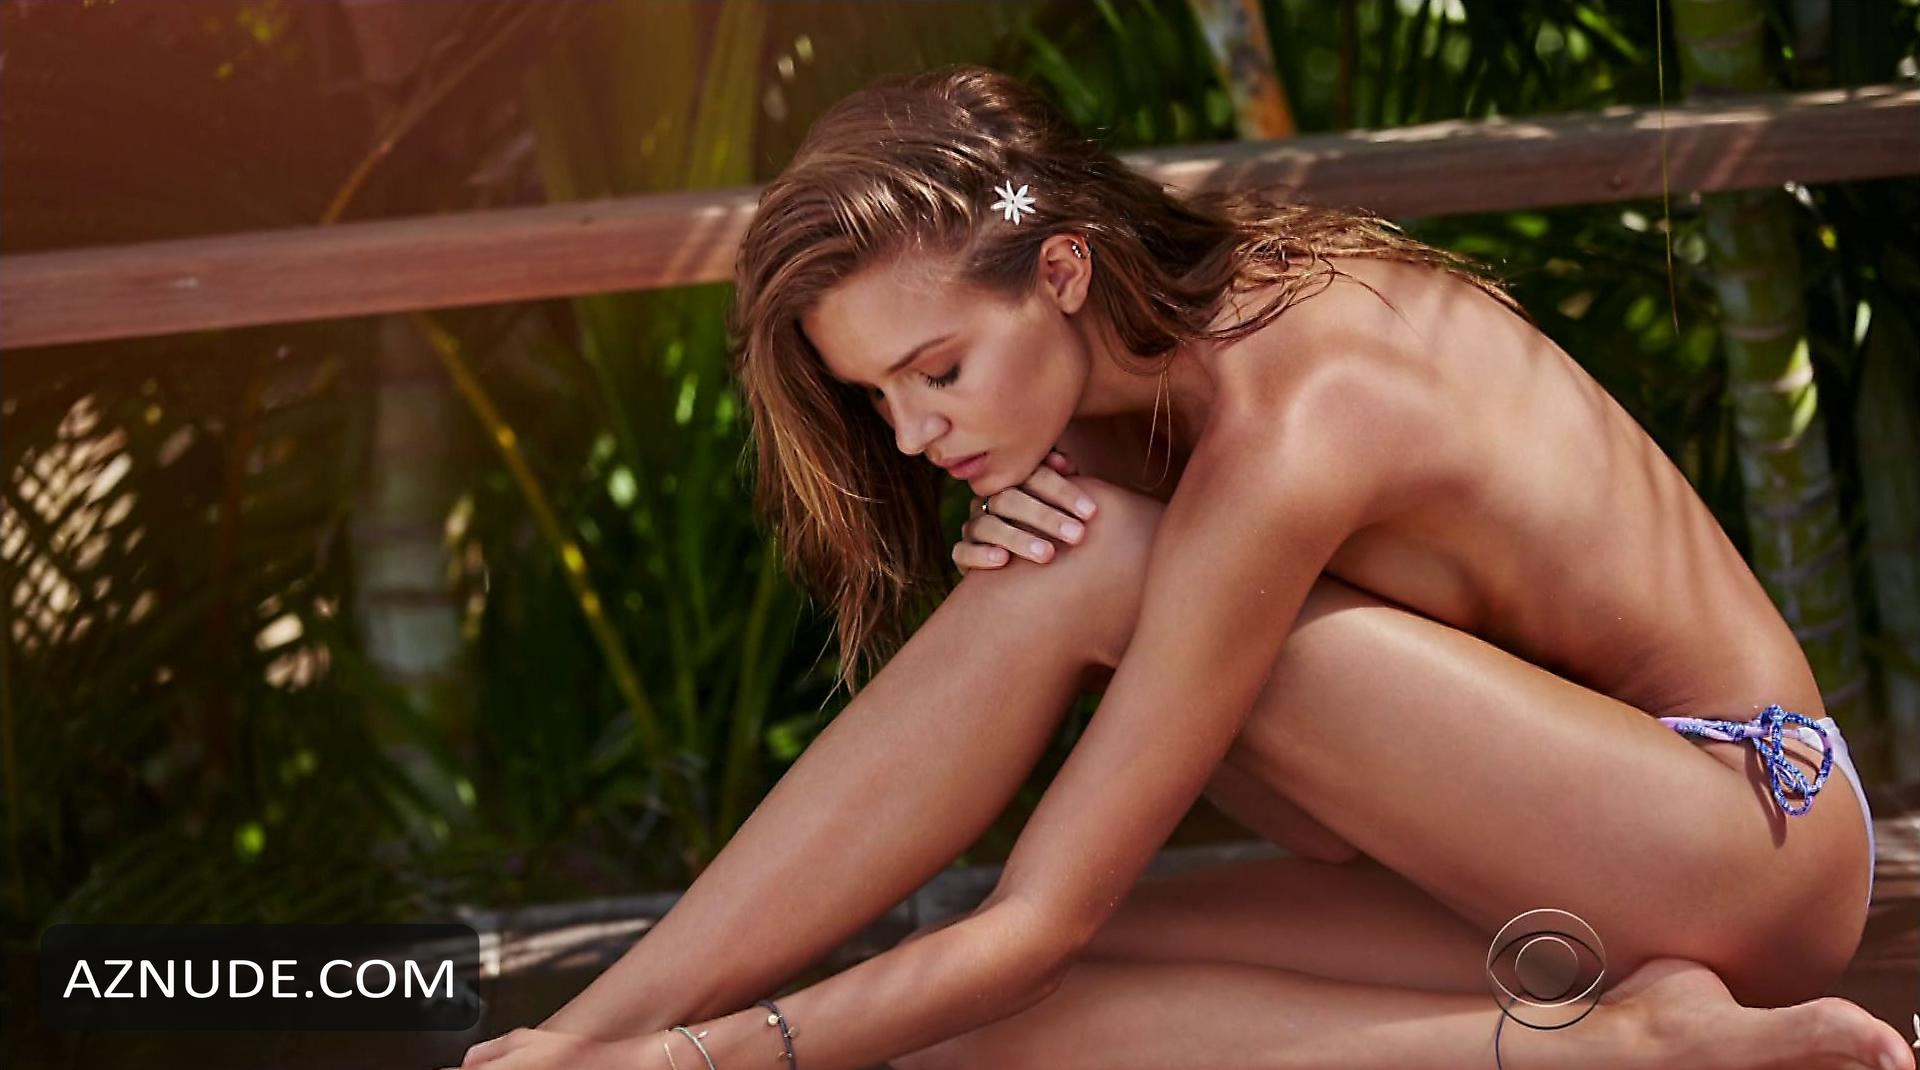 Angela Dodson Porn browse celebrity blue bikini bottom images - page 1 - aznude